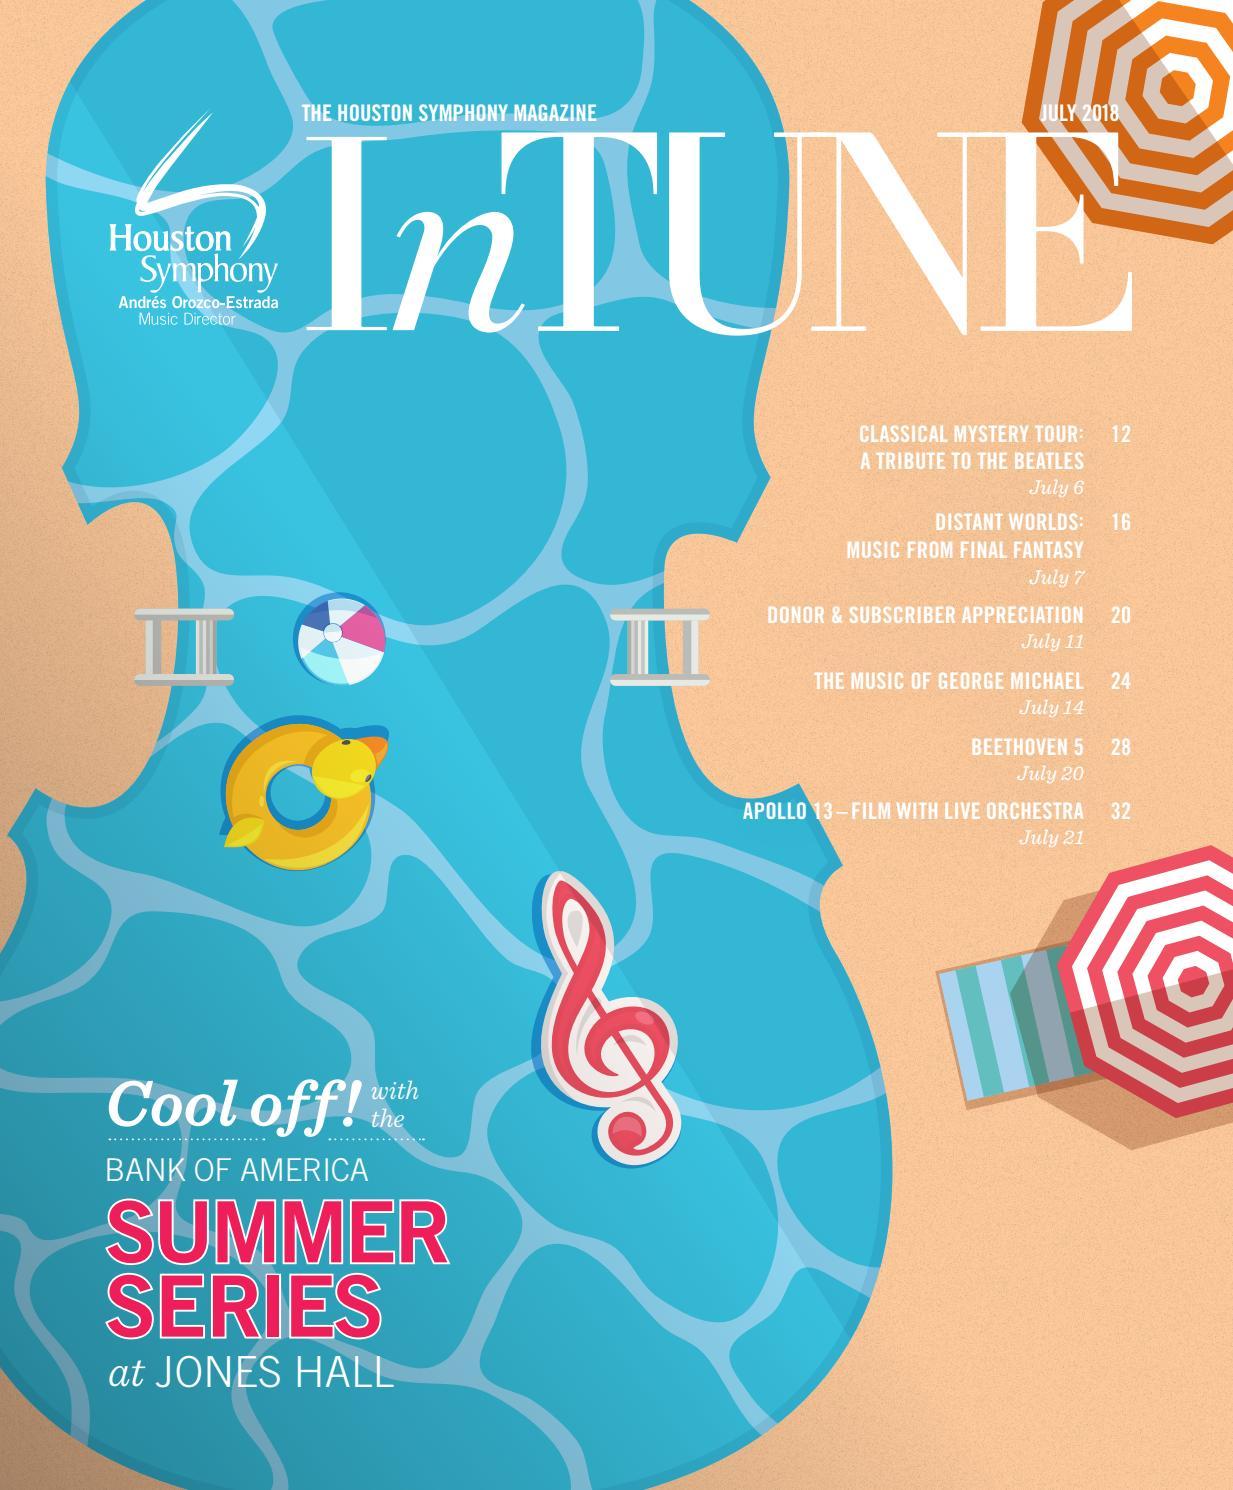 61a2ec52eb InTune — The Houston Symphony Magazine — July 2018 by Houston ...